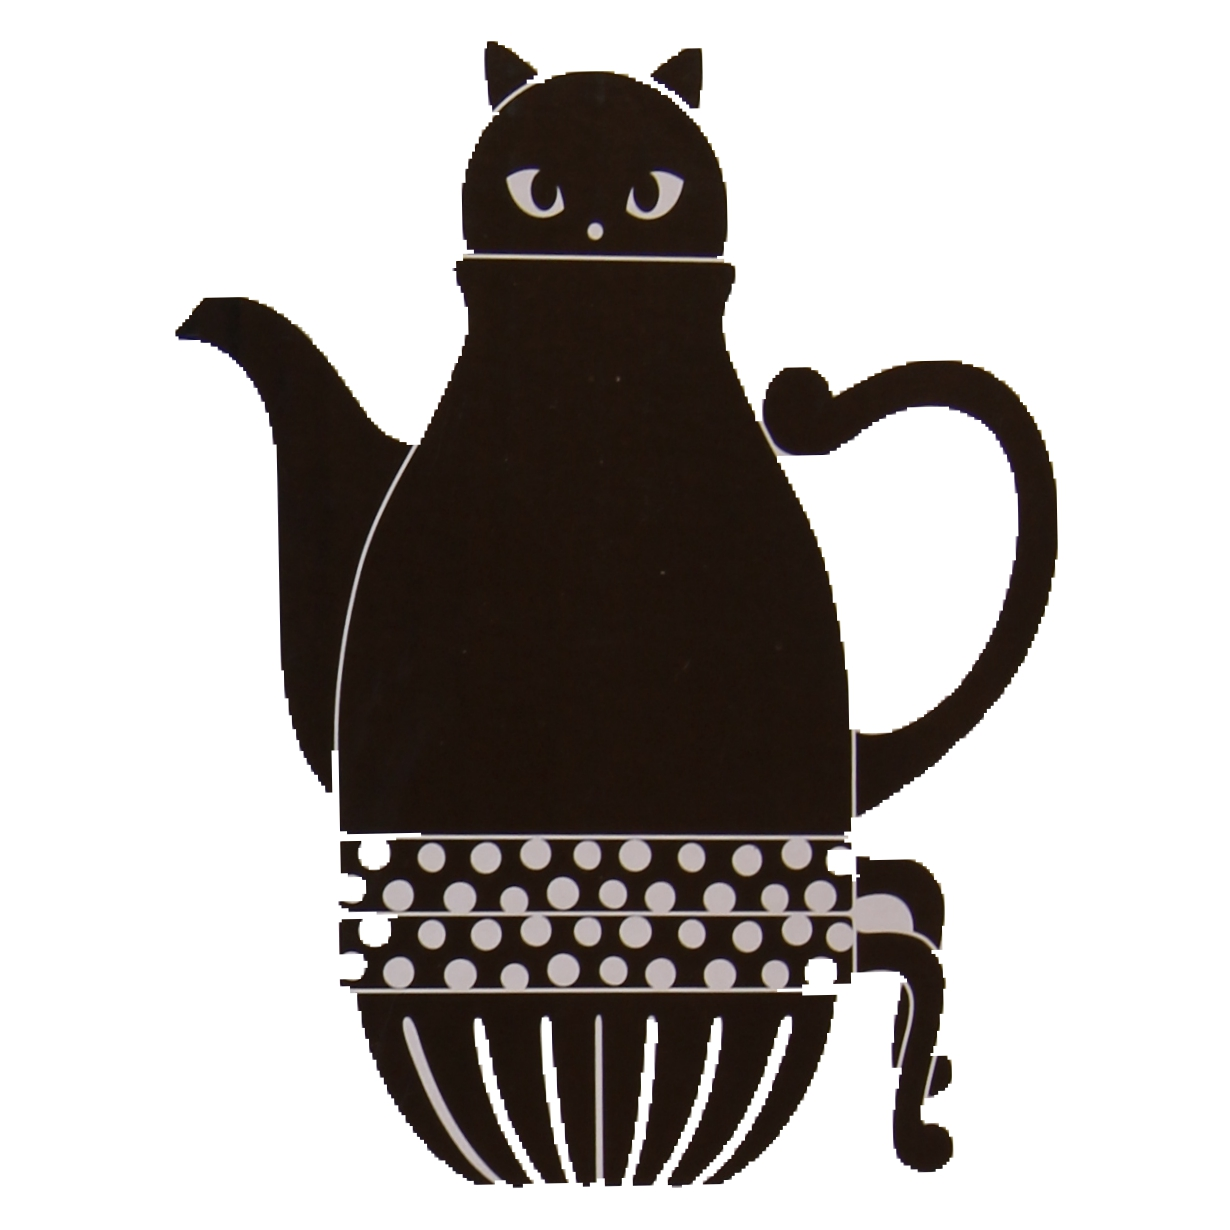 Japanese Cat Teapots Cute Coffee Sets Creative Cartoon Tea Pot Cup Ceramic Home Milk Mugs Cute Japanese Teapot 1 Pot and 2 CupsJapanese Cat Teapots Cute Coffee Sets Creative Cartoon Tea Pot Cup Ceramic Home Milk Mugs Cute Japanese Teapot 1 Pot and 2 Cups